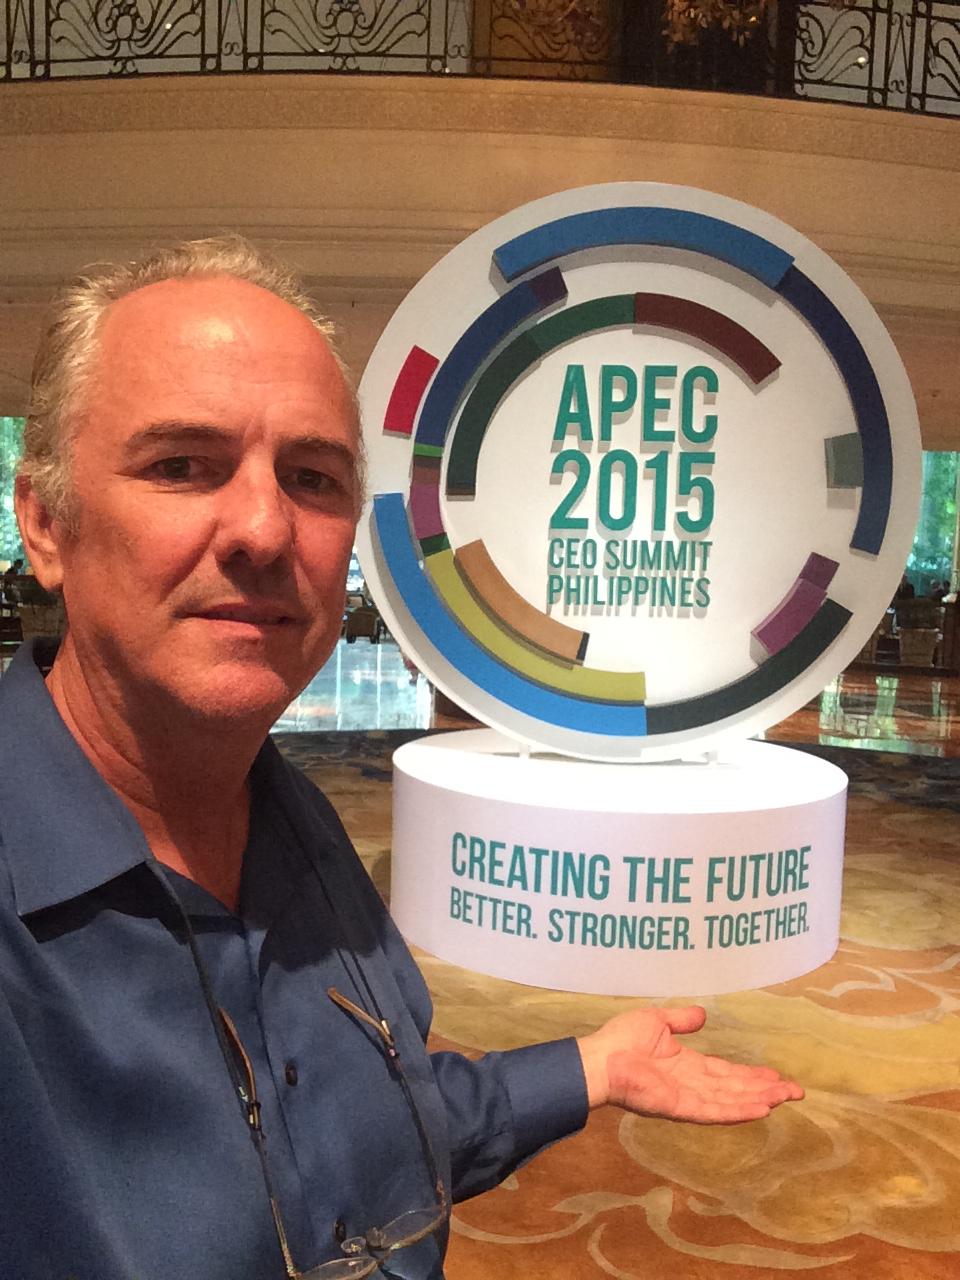 BBK20151115-APEC-HeadShot-IntlReporter1_edited